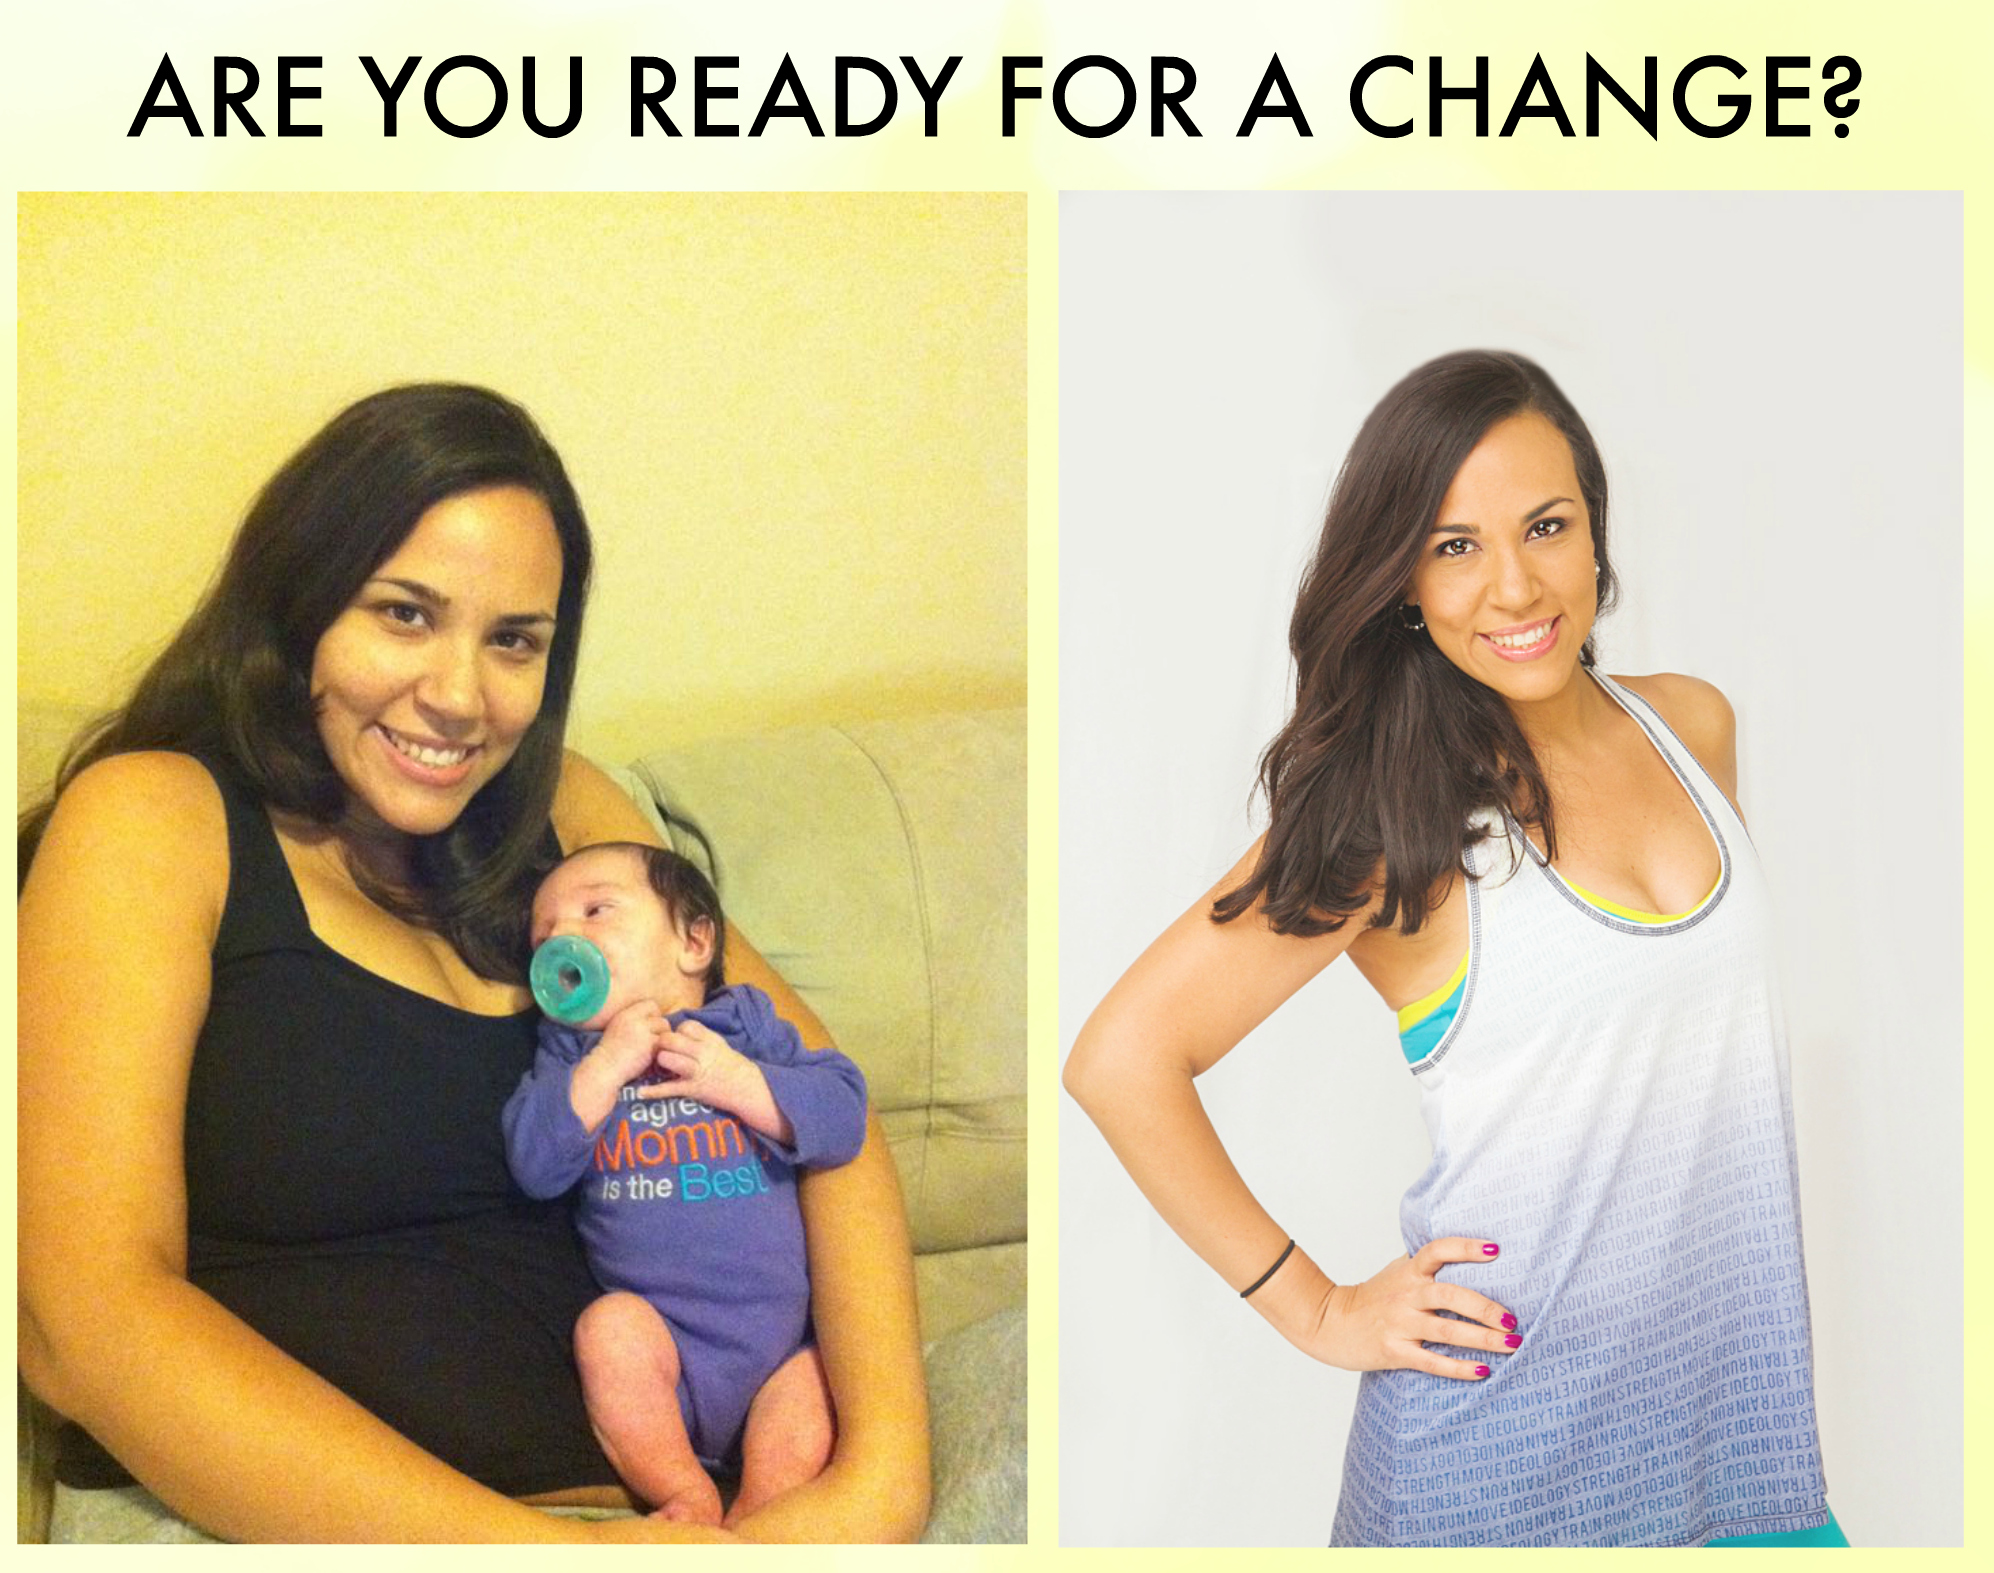 transformation pic.jpg